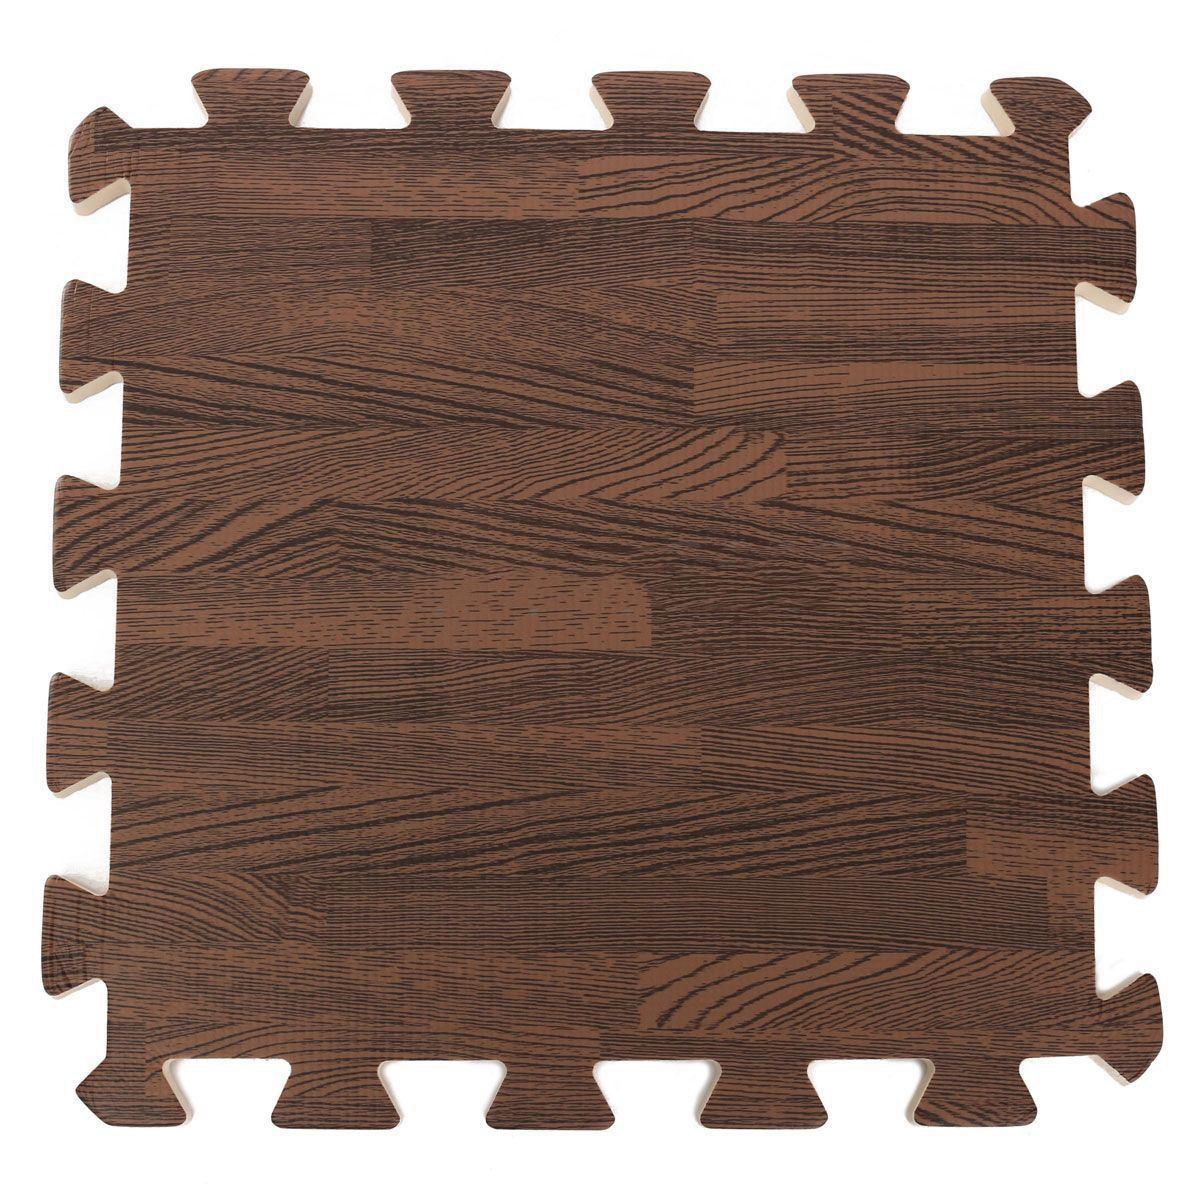 36 Pcs Interlocking EVA Foam Floor Tiles Light Wood Grain Colour Gym Exercise